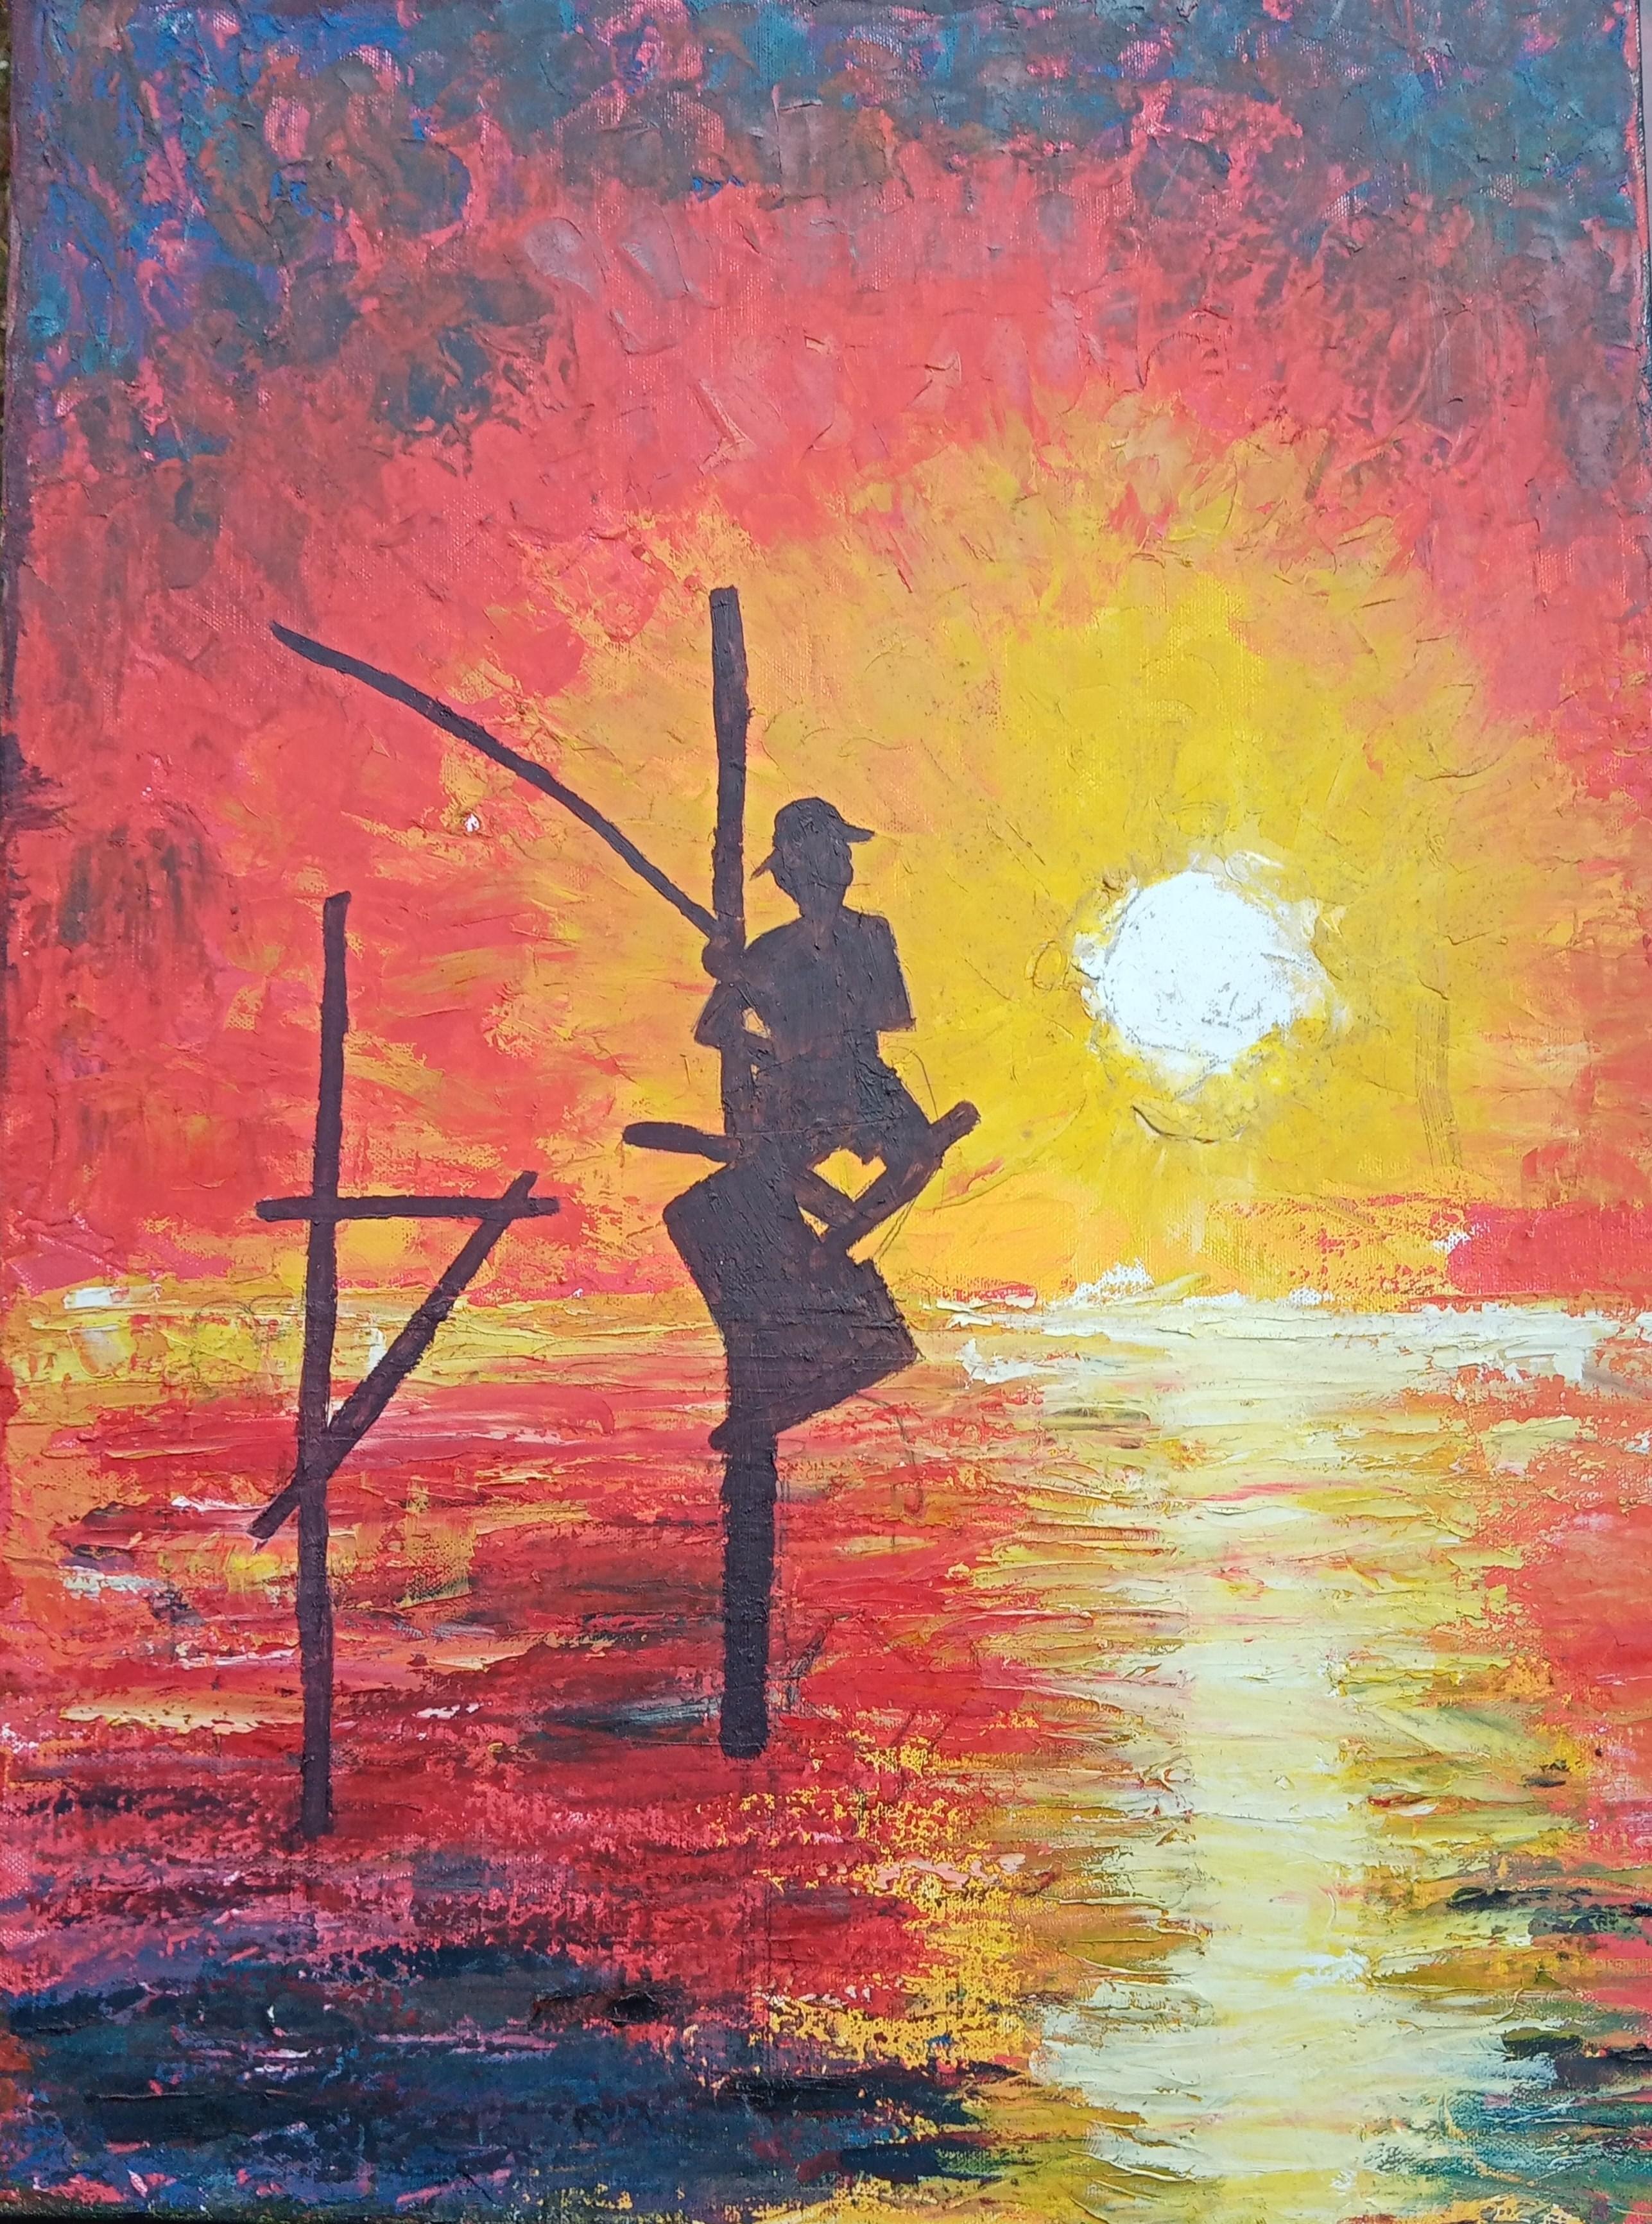 Fisherman at dusk by Arthana Pushpalingam